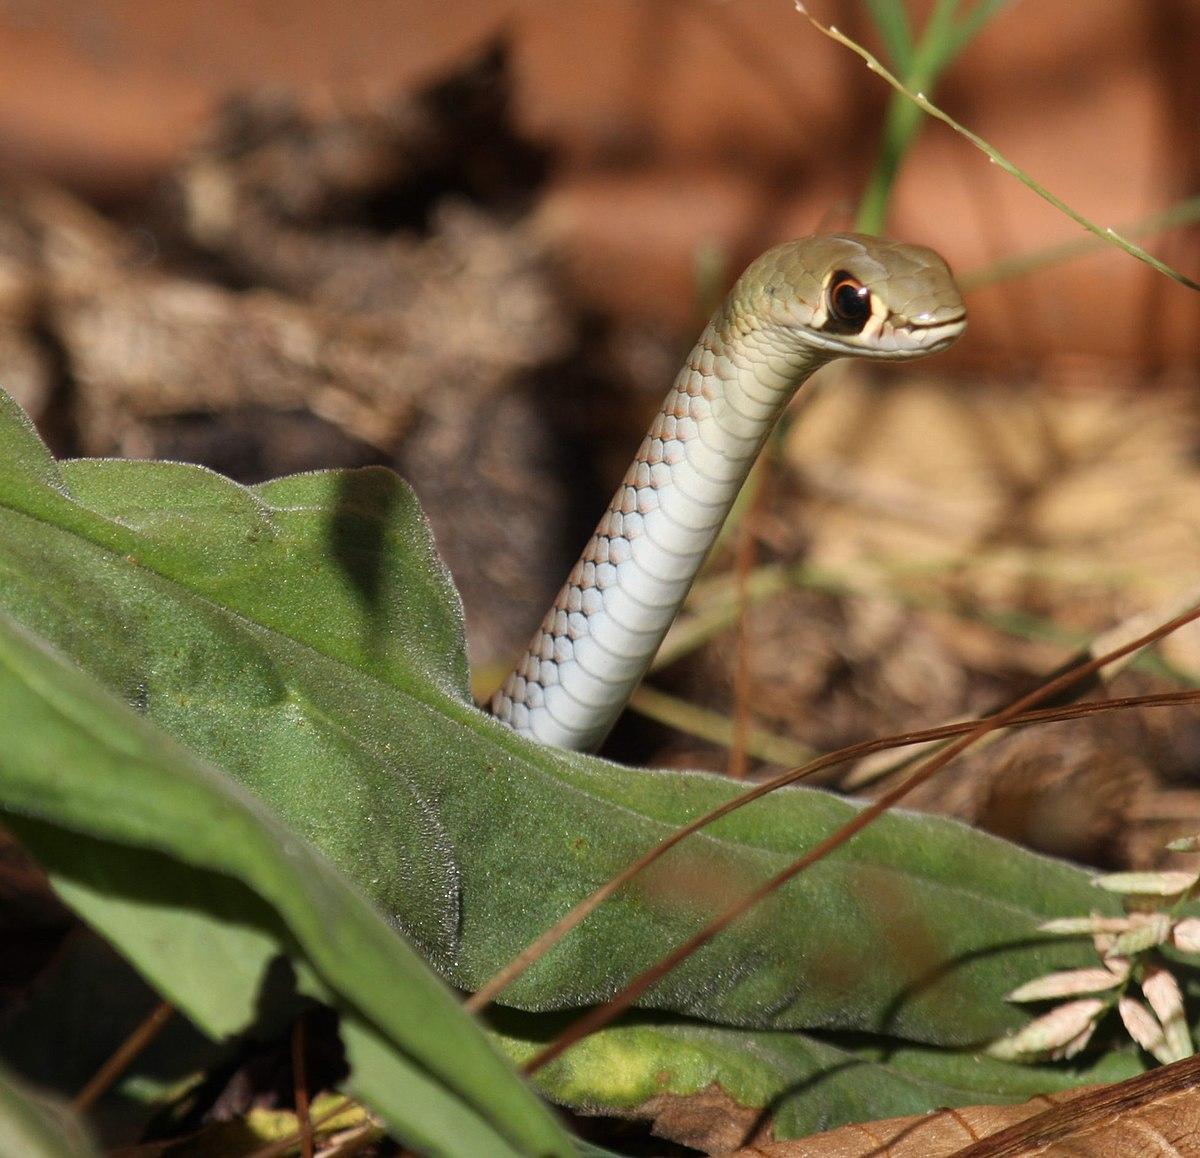 snake - photo #47